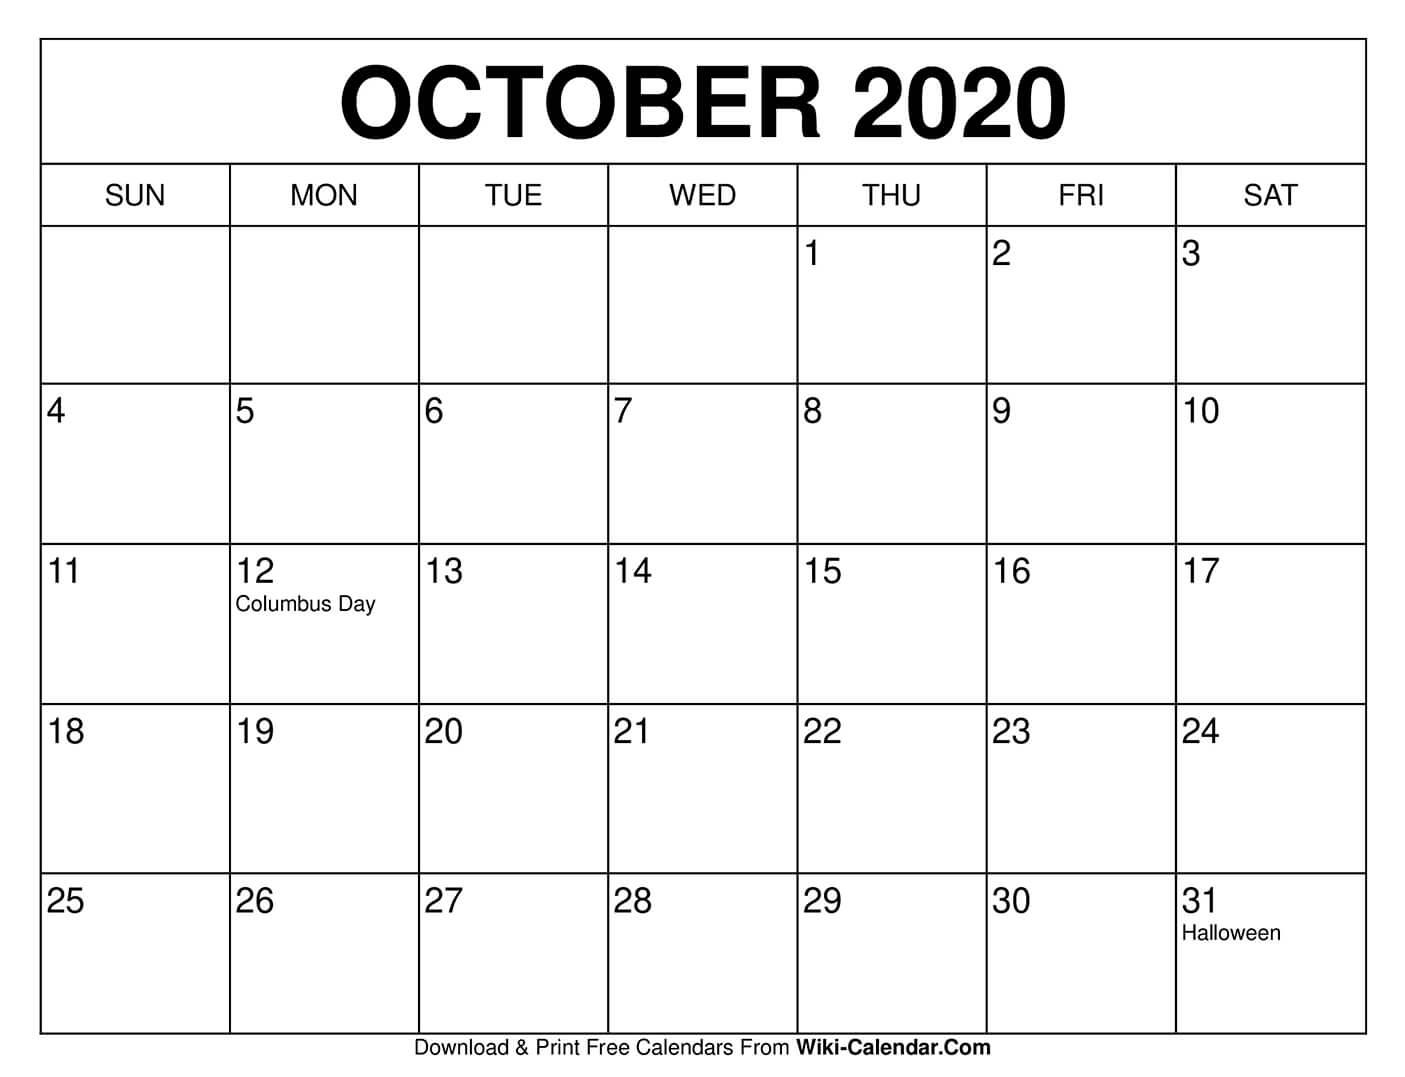 Free Printable October 2020 Calendars with regard to 8.5 X 11 Free Printable Calendars